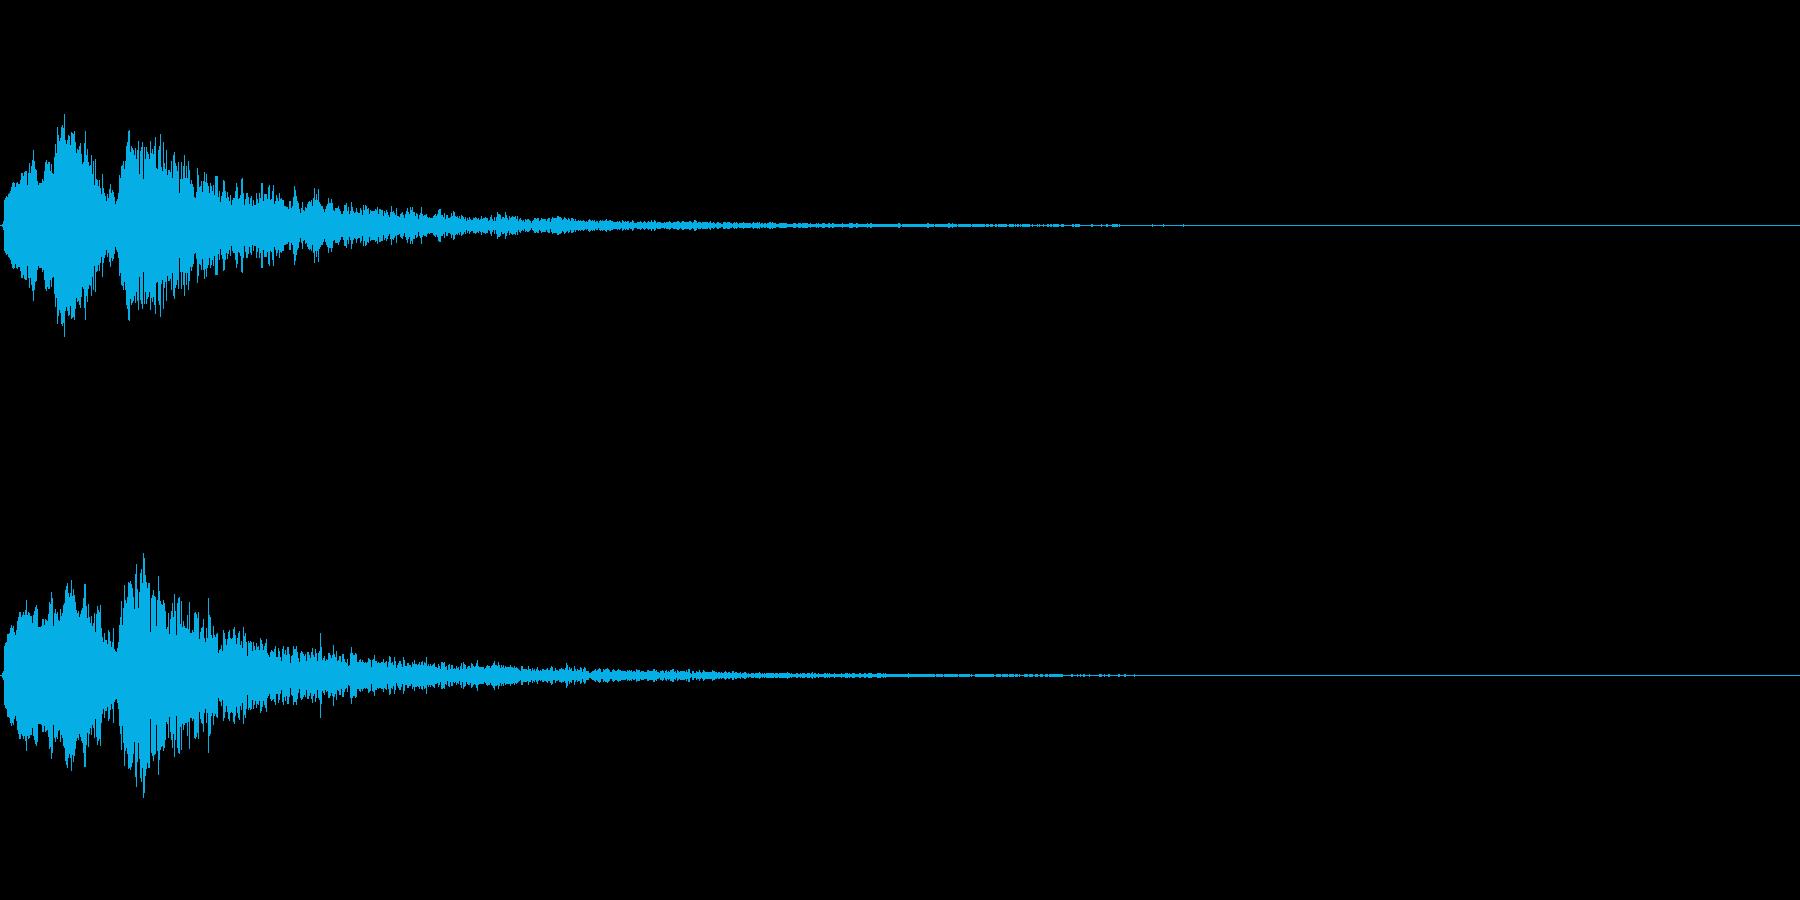 Vox 不気味な鳴き声 ホラーSE 1の再生済みの波形